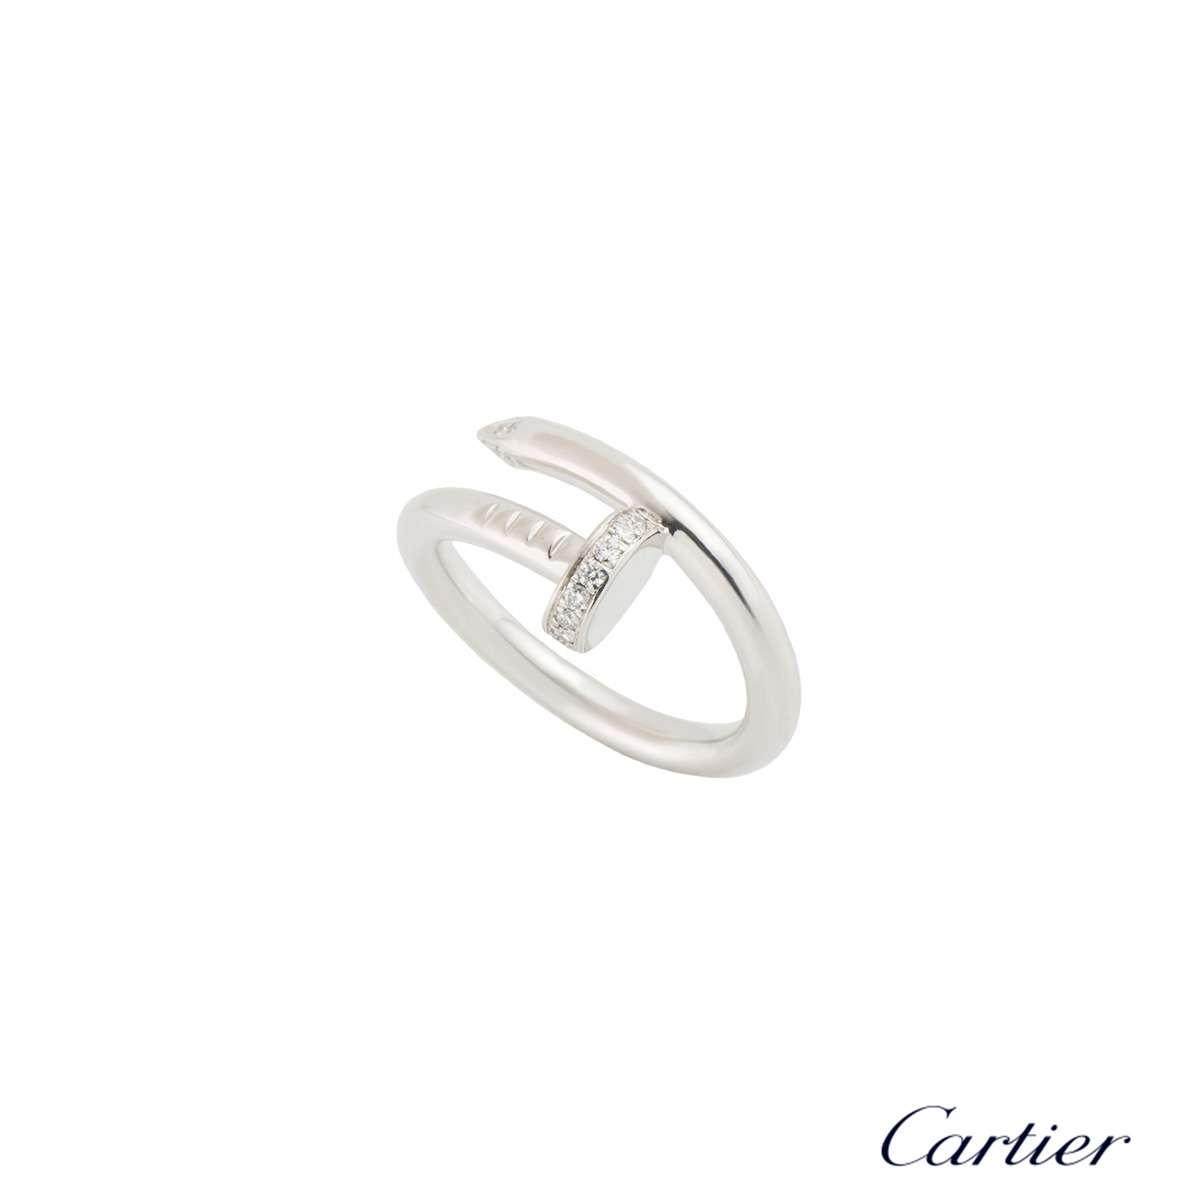 Cartier White Gold Diamond Juste Un Clou Ring Size 53 B4092753